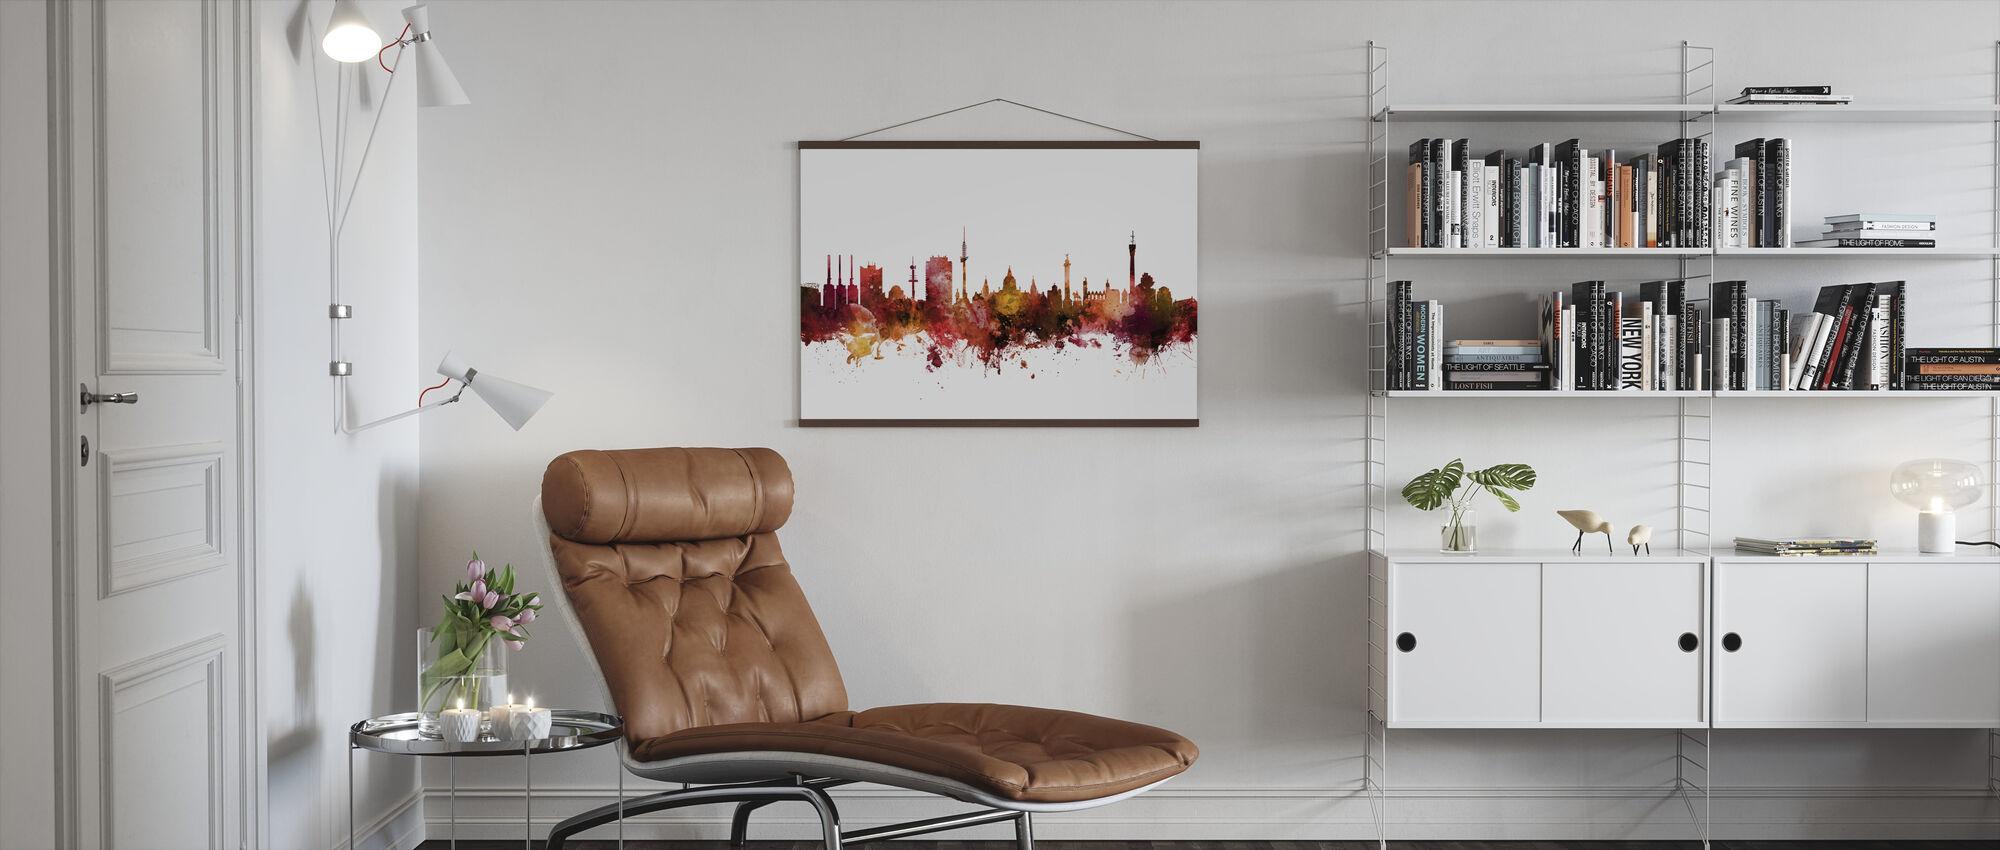 Hannover Germany Skyline - Poster - Living Room